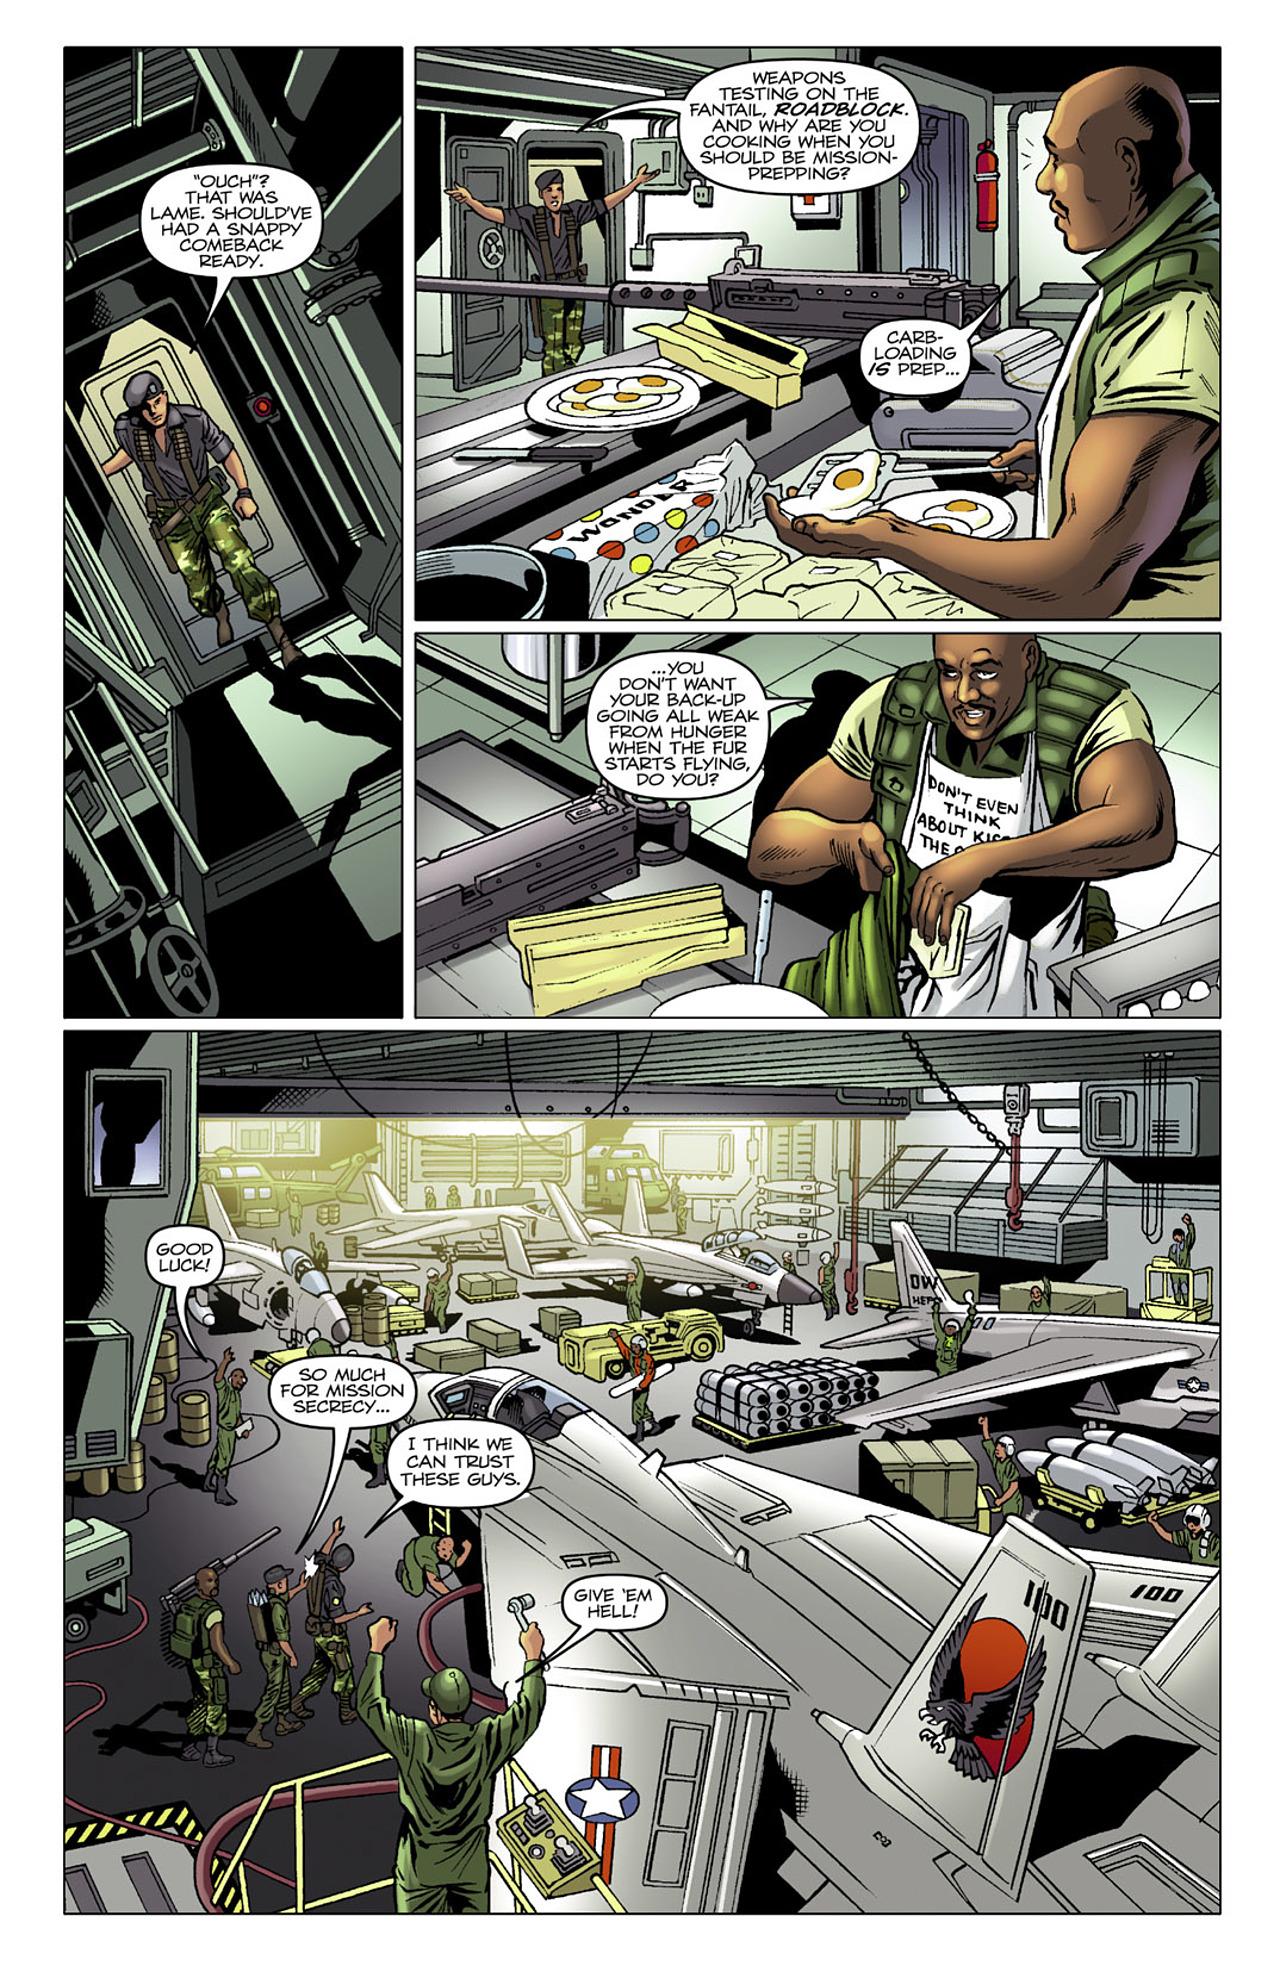 G.I. Joe: A Real American Hero 170 Page 5